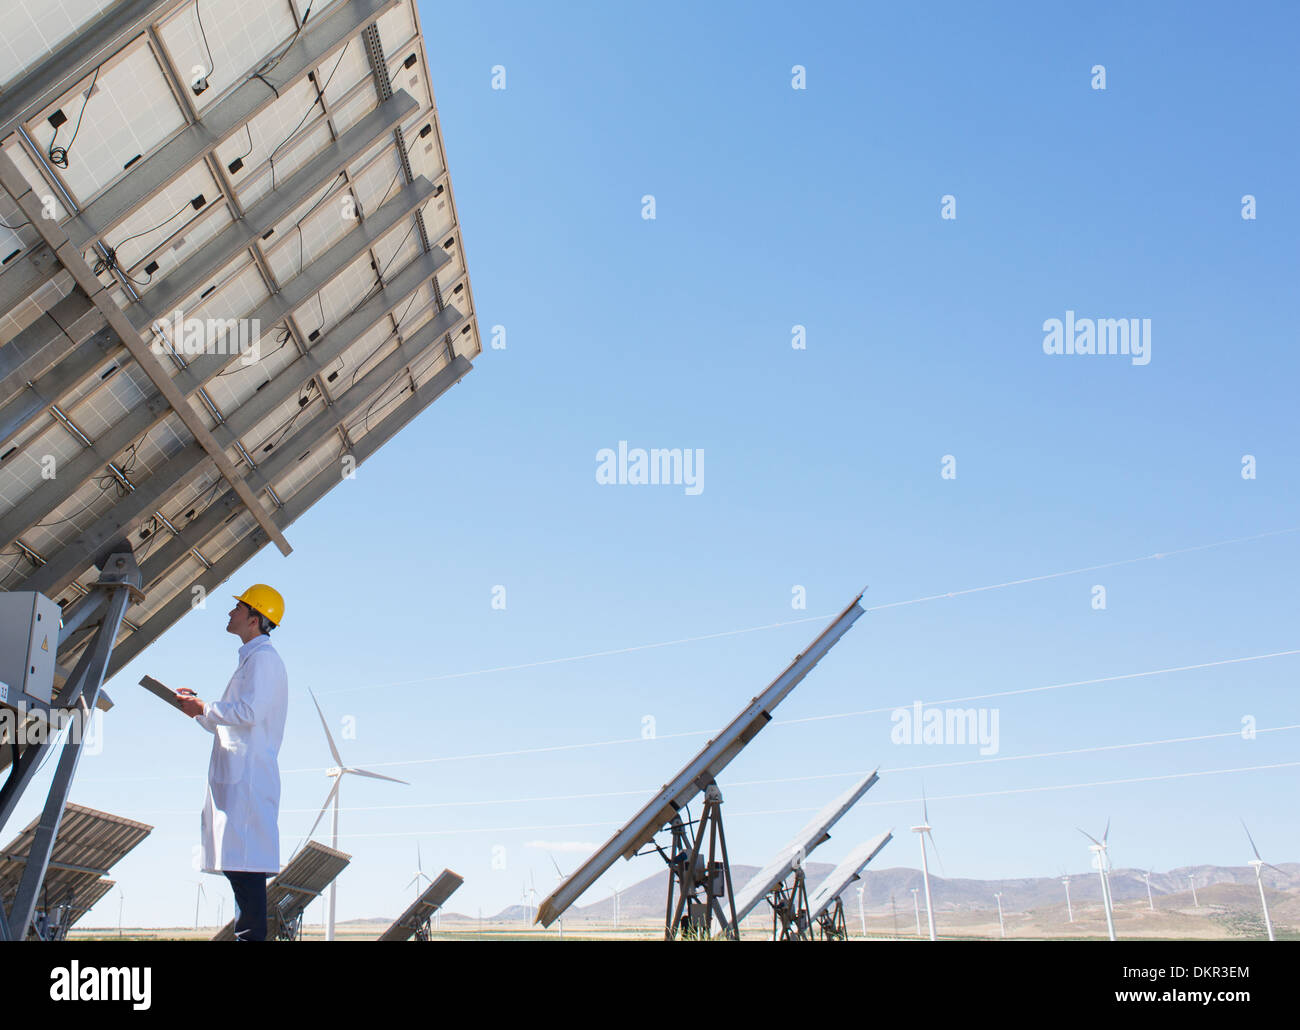 Scientist examining solar panel in rural landscape - Stock Image